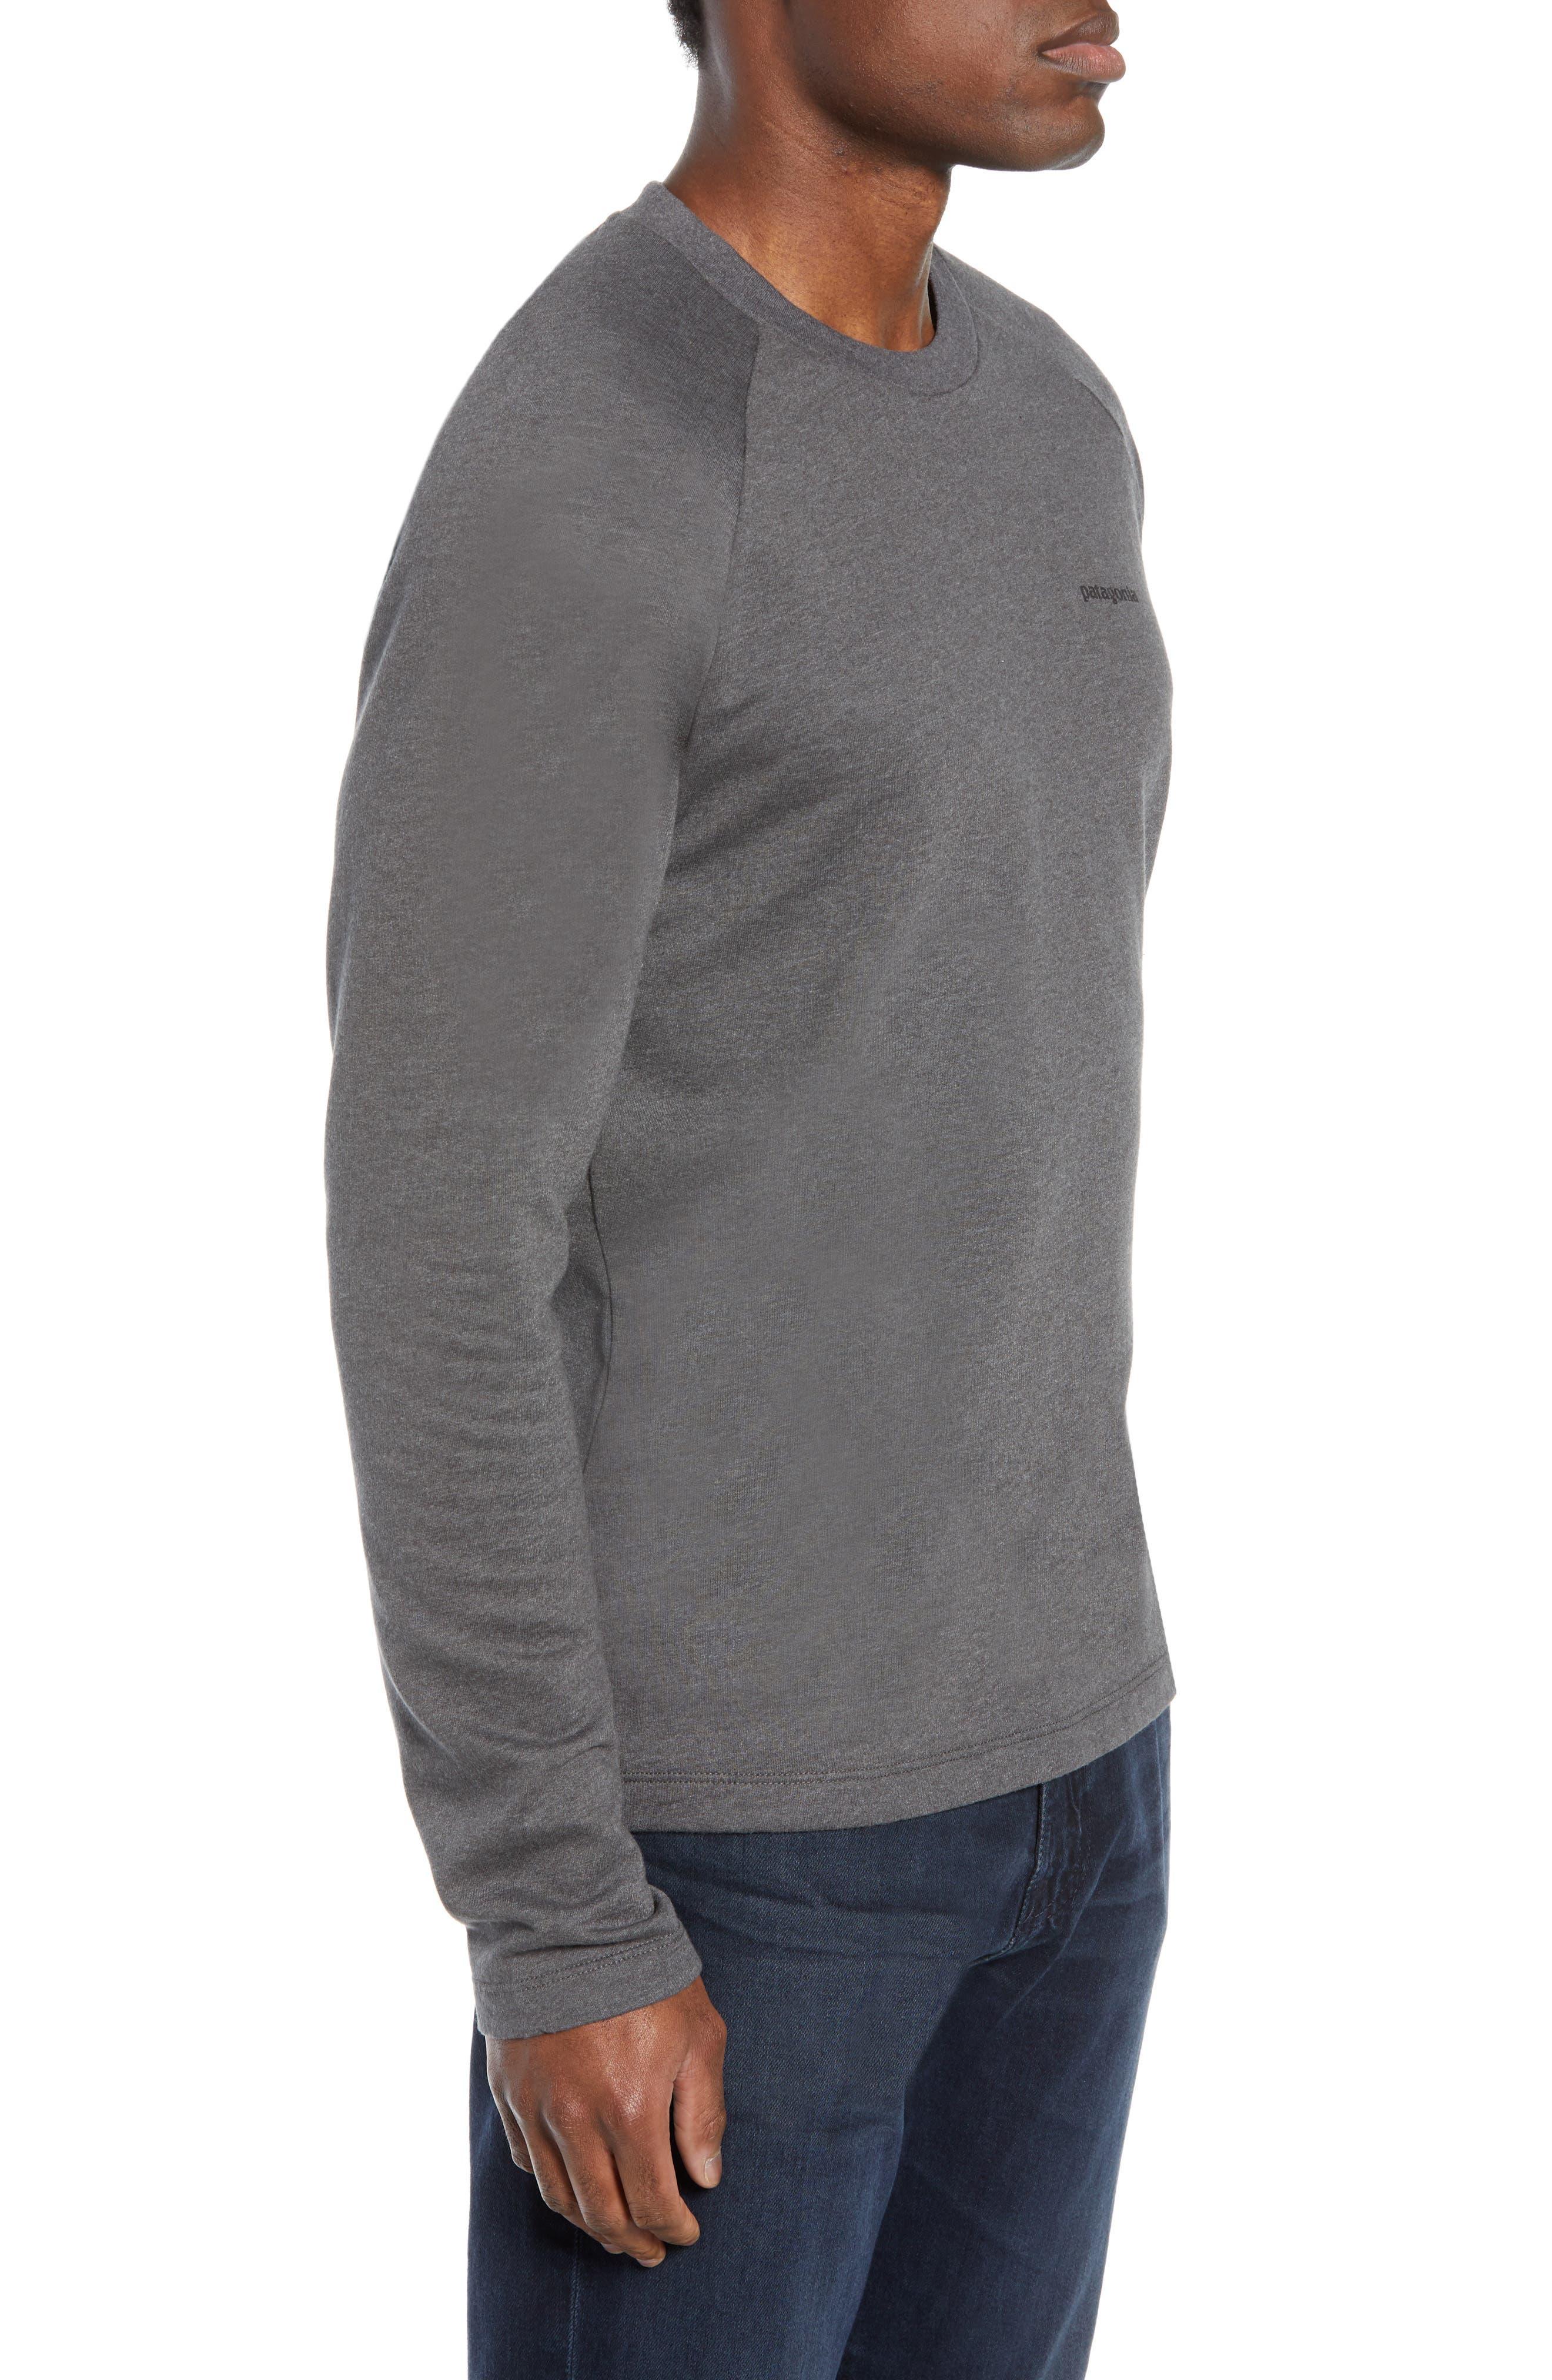 PATAGONIA,                             P-6 Logo Slim Fit Lightweight Sweatshirt,                             Alternate thumbnail 3, color,                             FORGE GREY